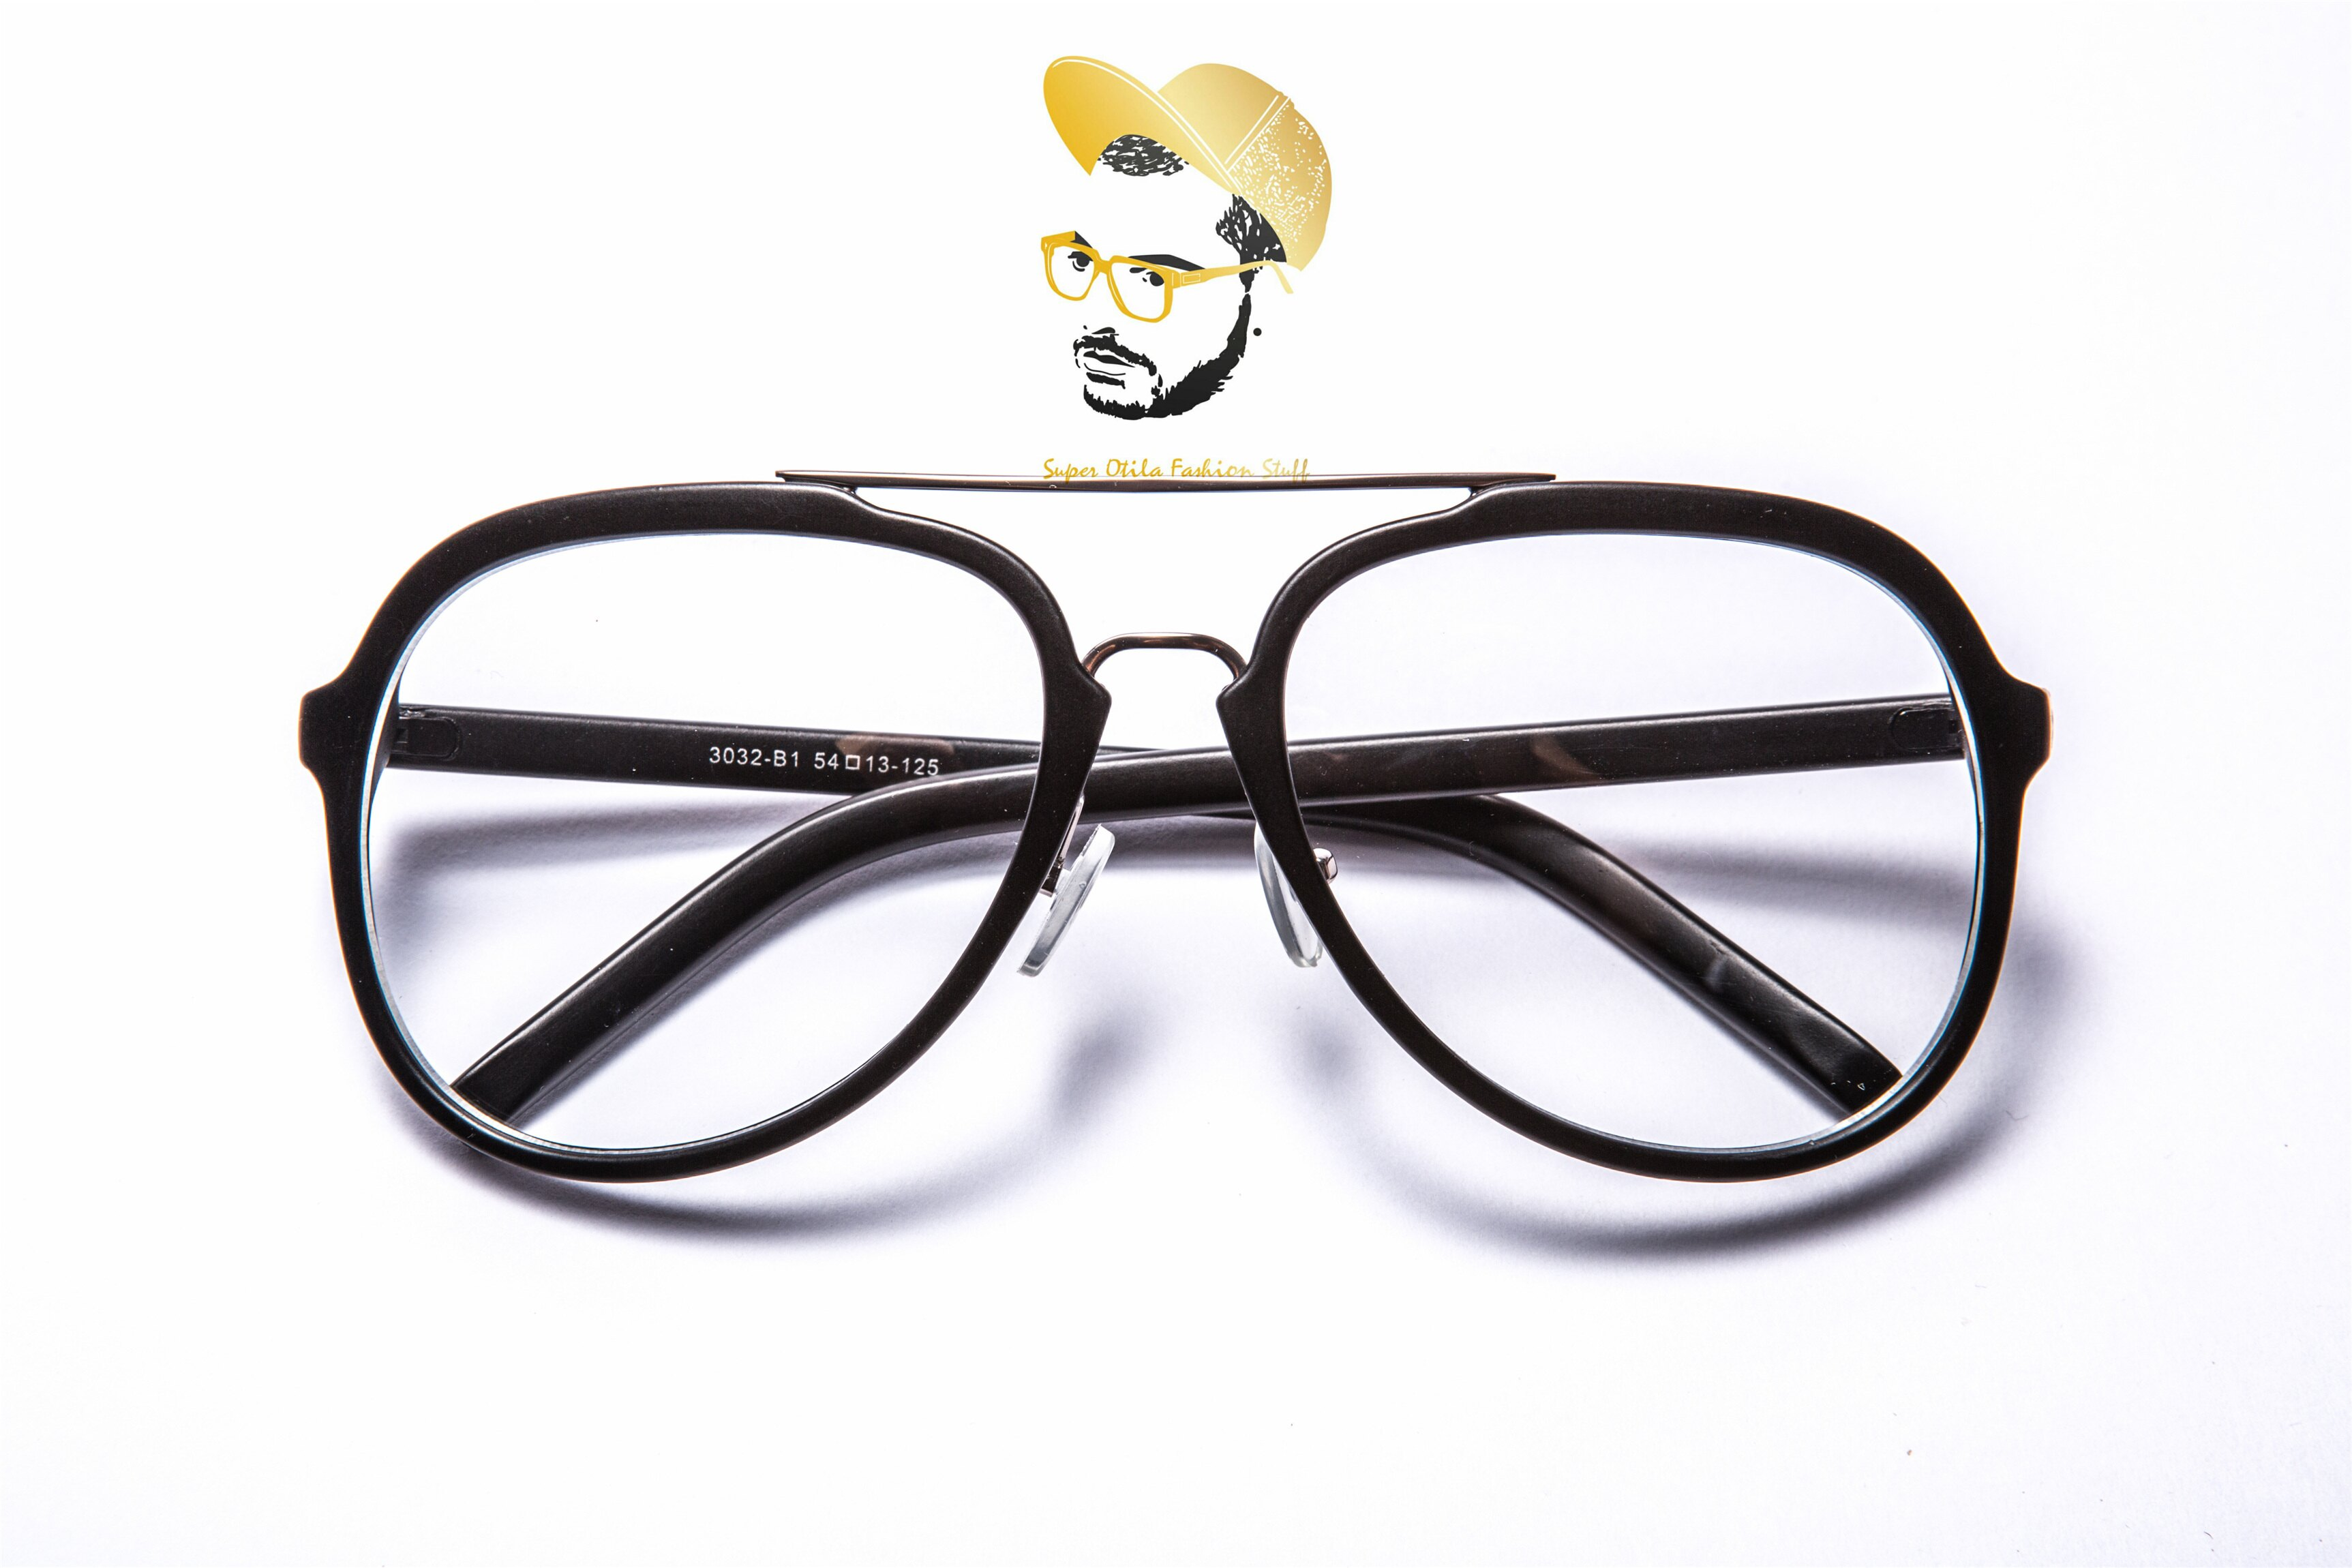 glasses for lovers 太陽眼鏡 墨鏡 眼鏡 韓國 【3032】復古大框-色系齊全-BLACK潮人刷色